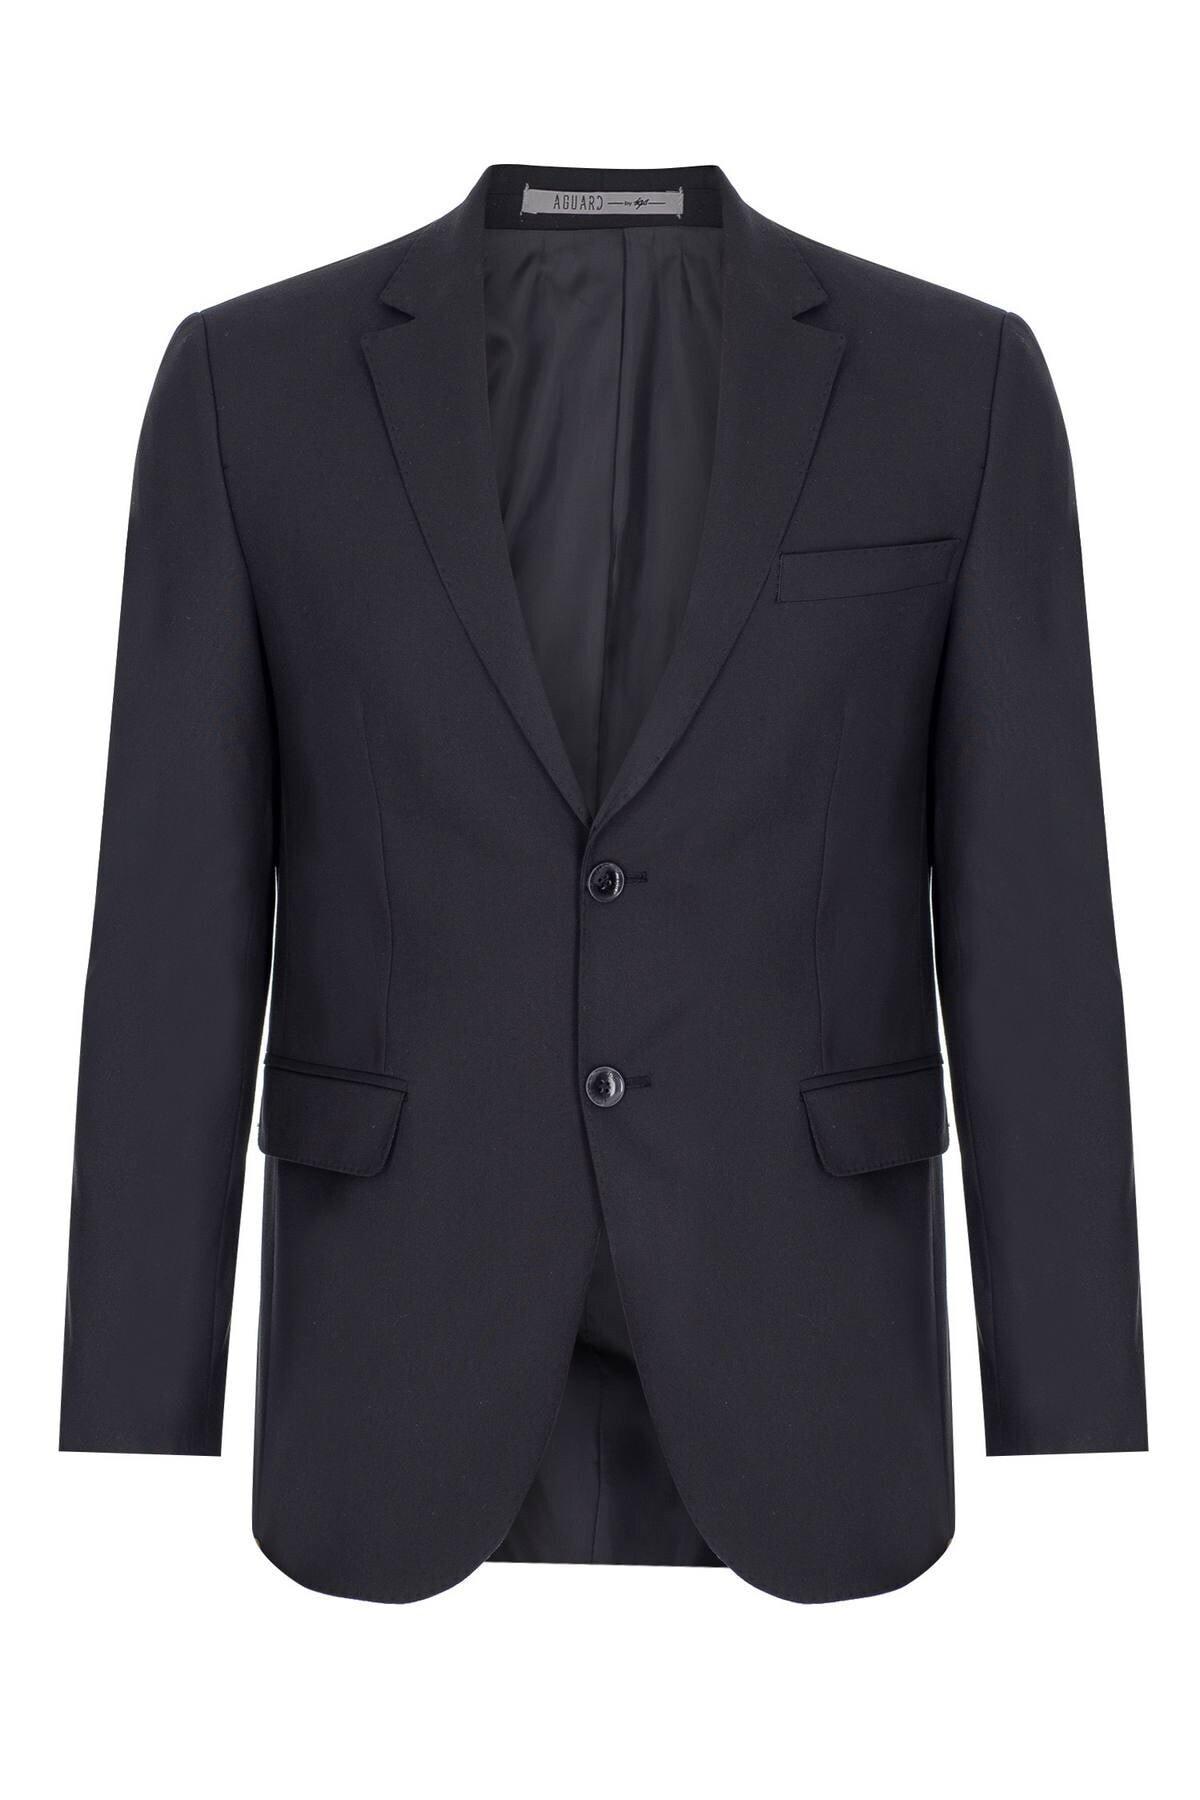 İgs Erkek K.lacivert Regularfıt / Rahat Kalıp Std Takım Elbise 2